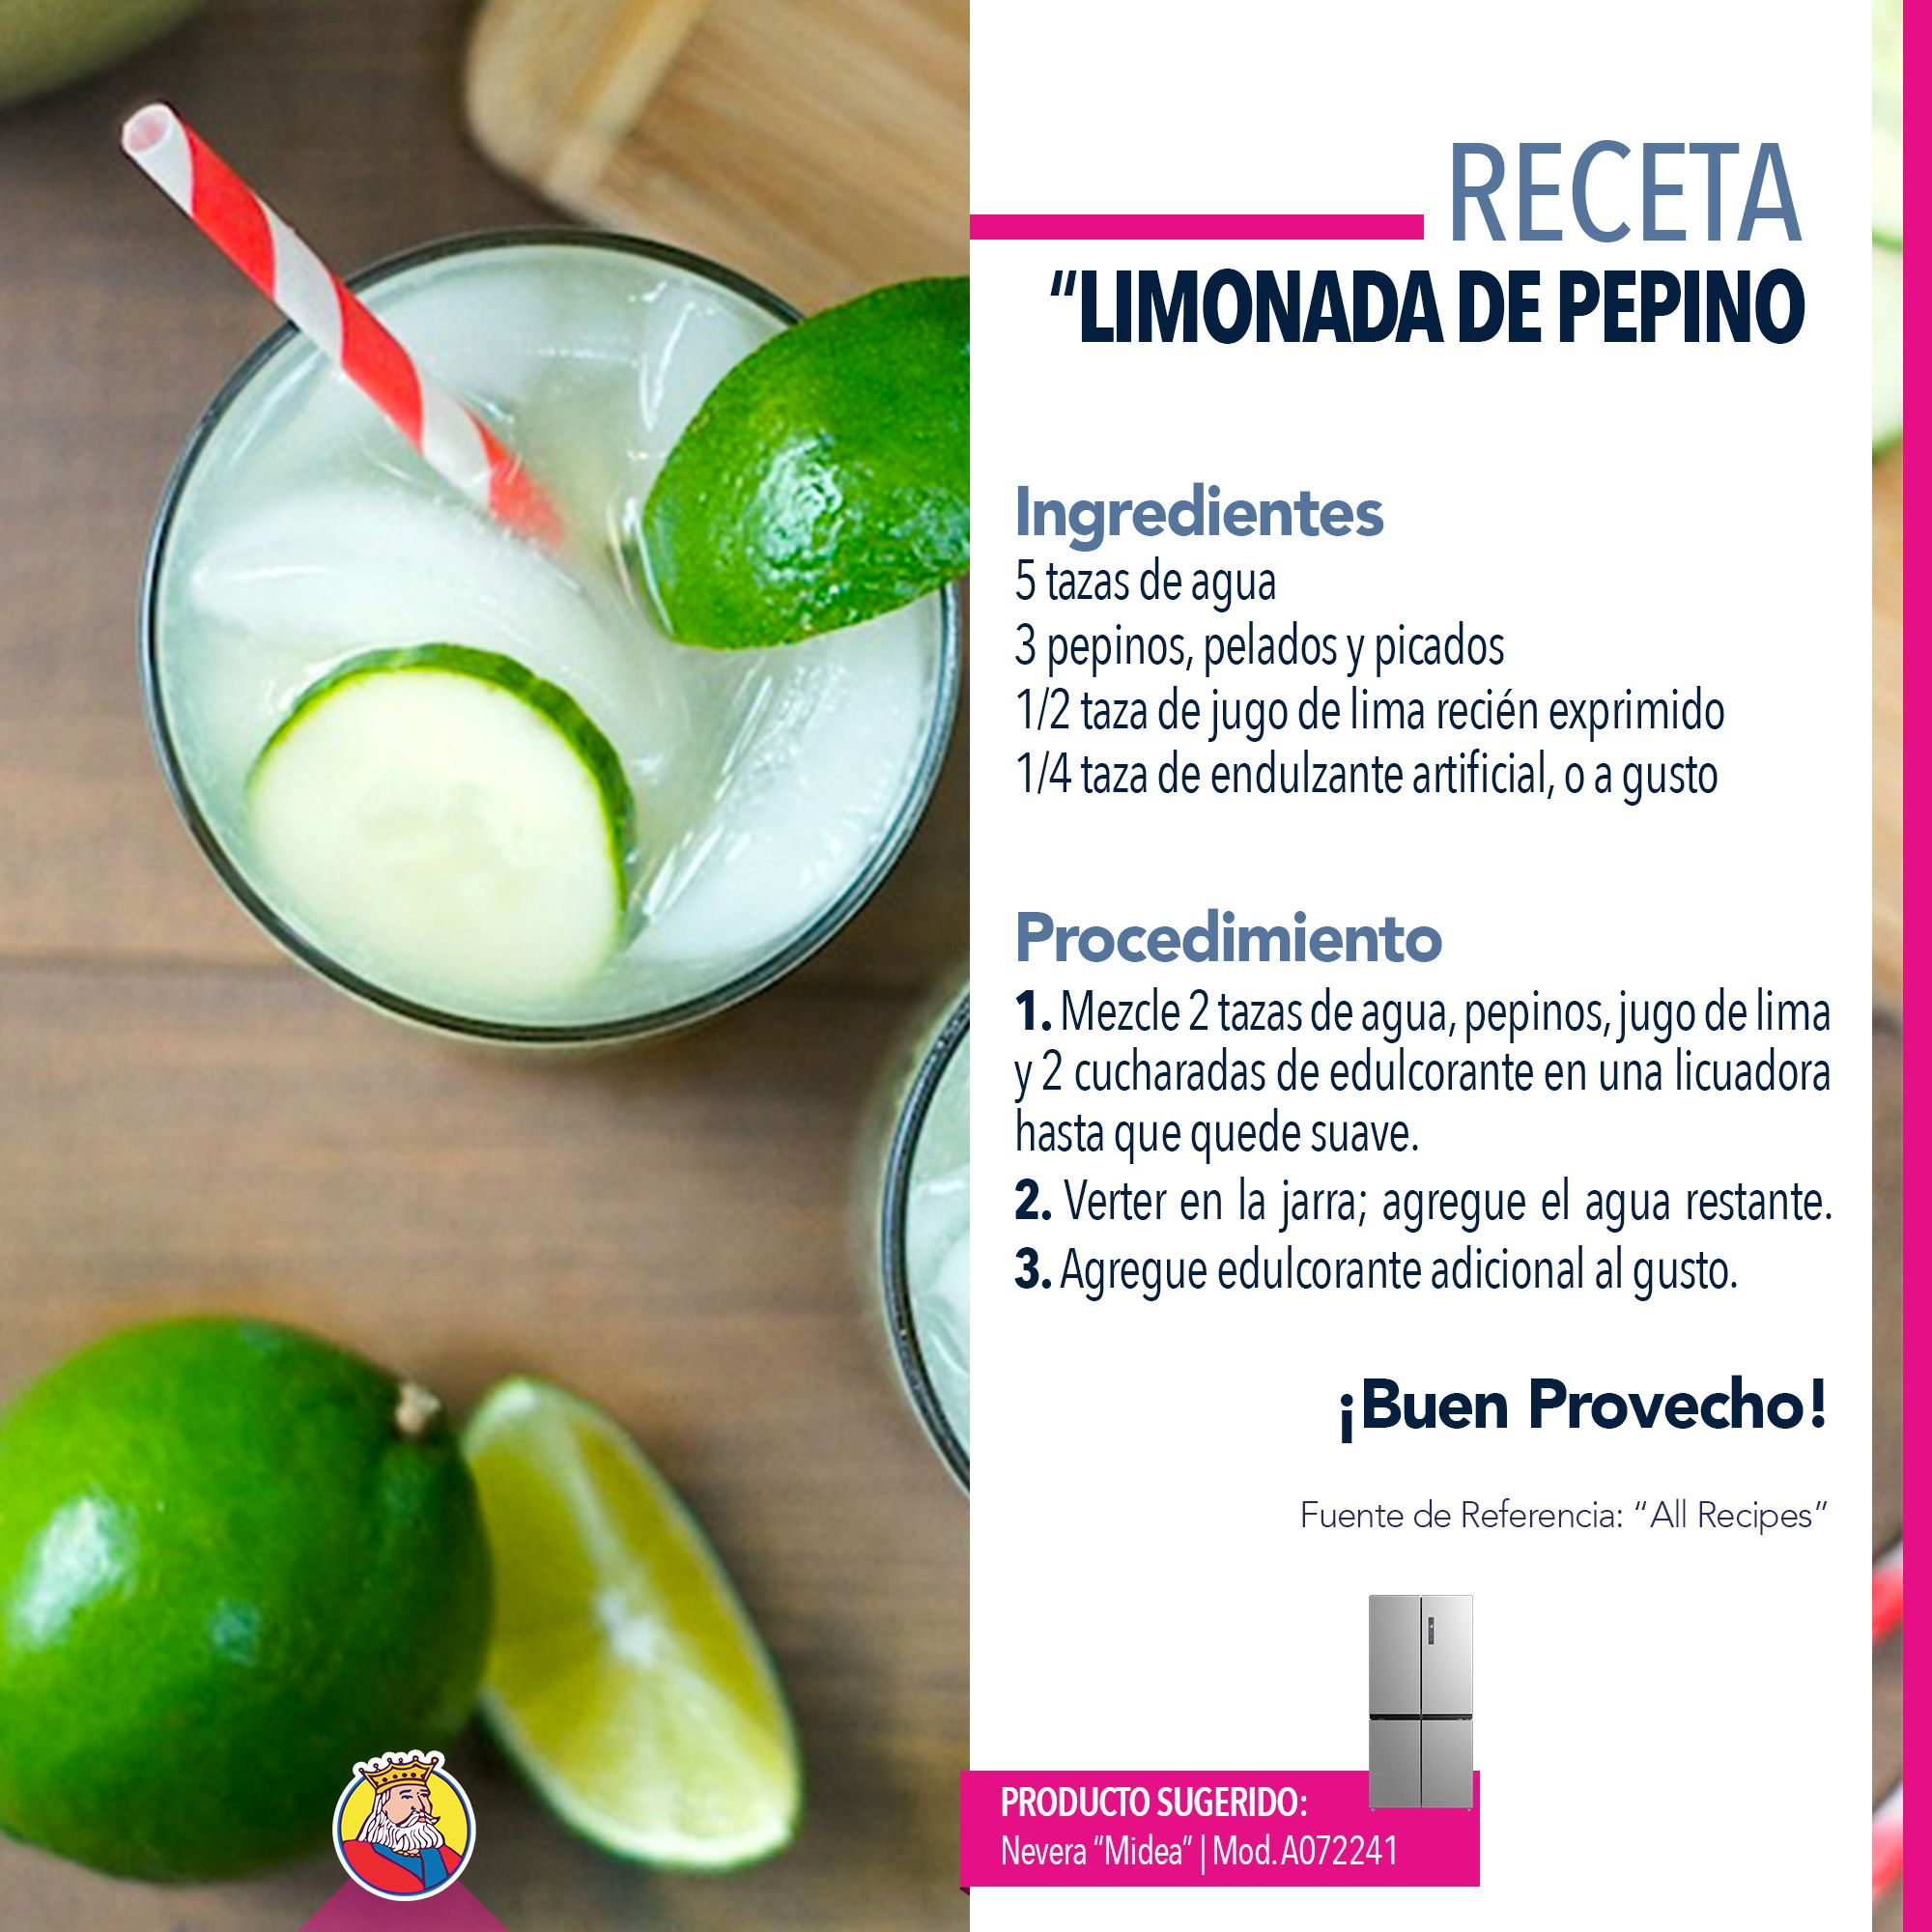 9d8605da18be73166c759be3b857cd38 - Limonadas Recetas